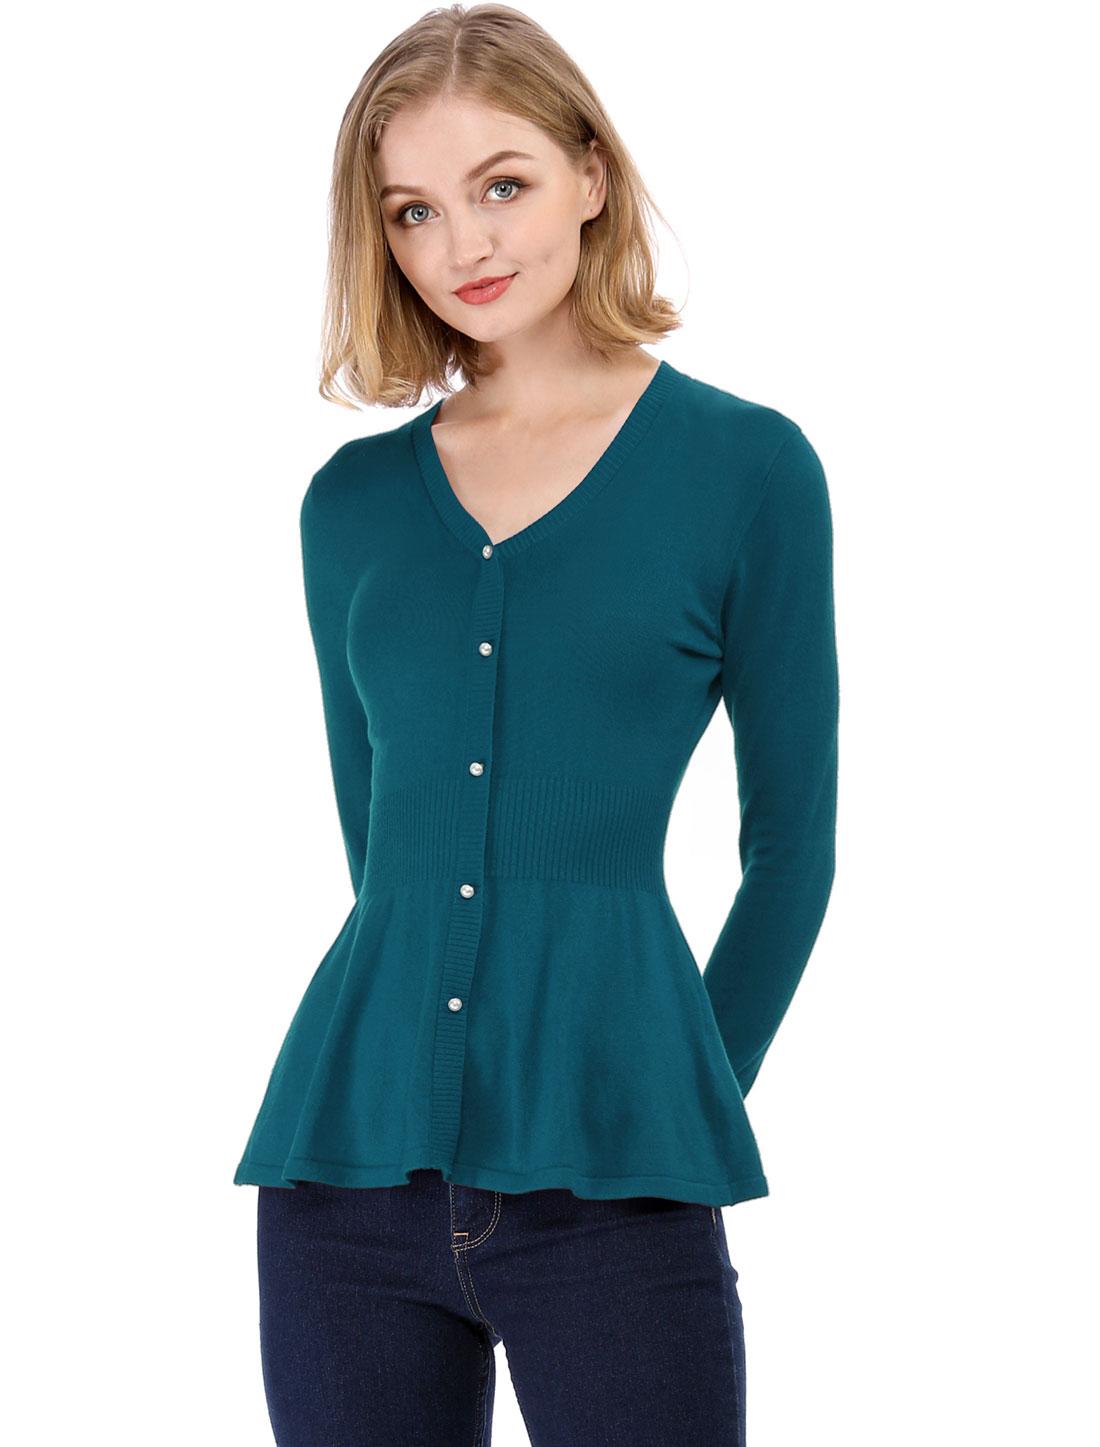 Women's Peplum Sweater Smocked Long Sleeve Knit Tops Blue Green M